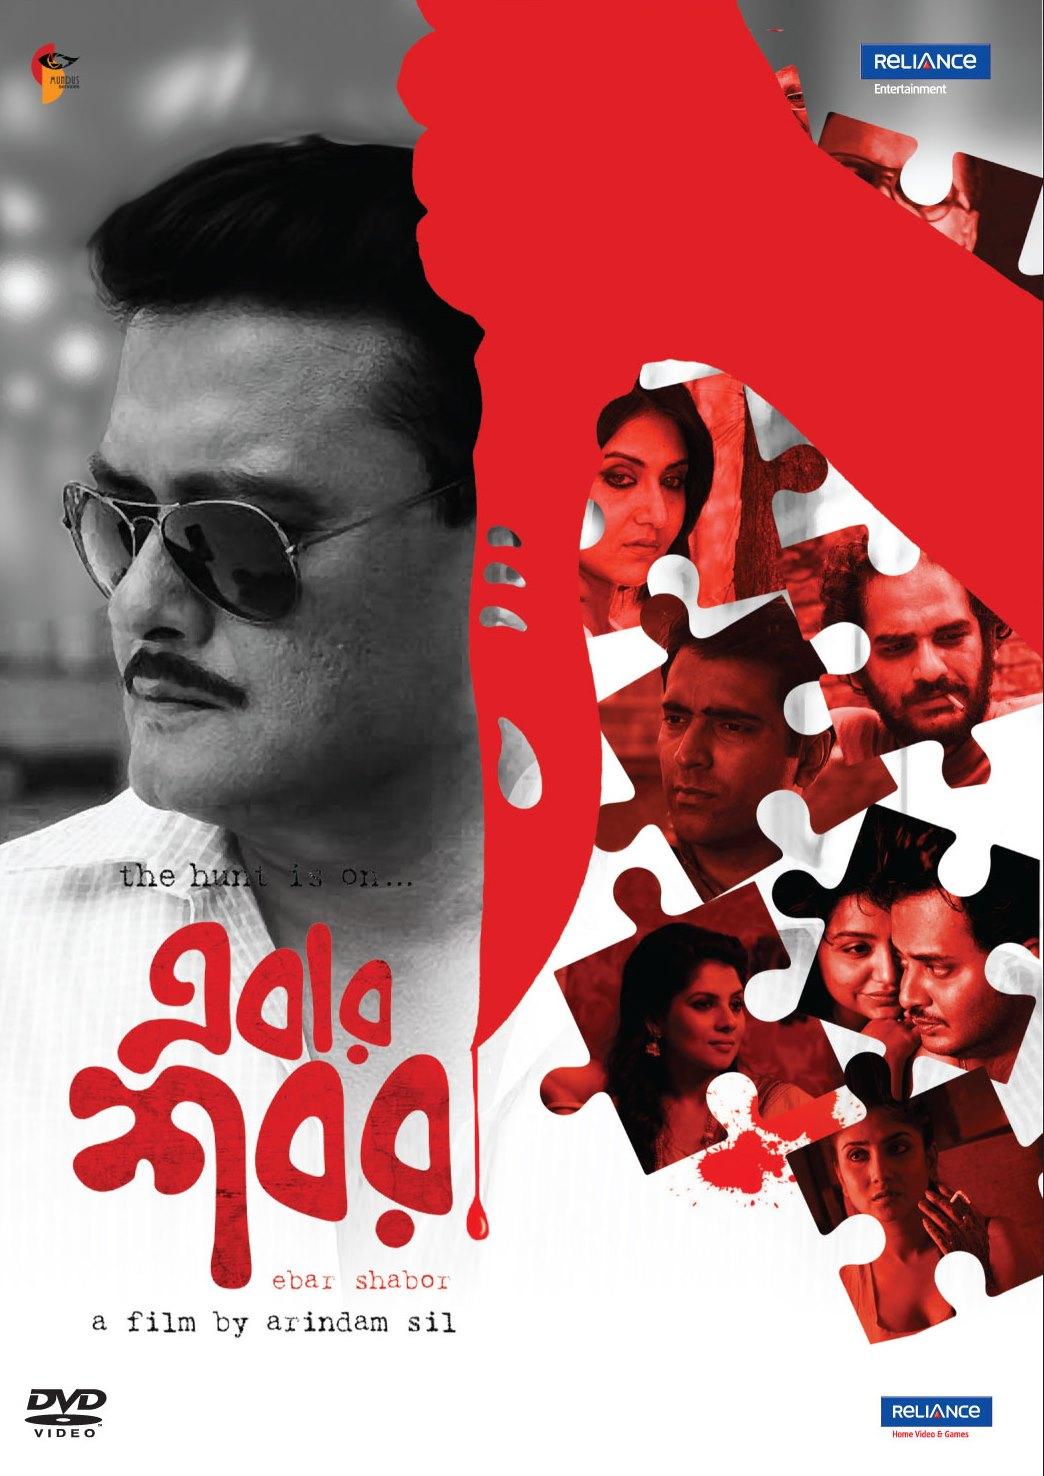 Ebar Shabor (2015) Bengali 720p WEB-DL x265 AAC 800MB